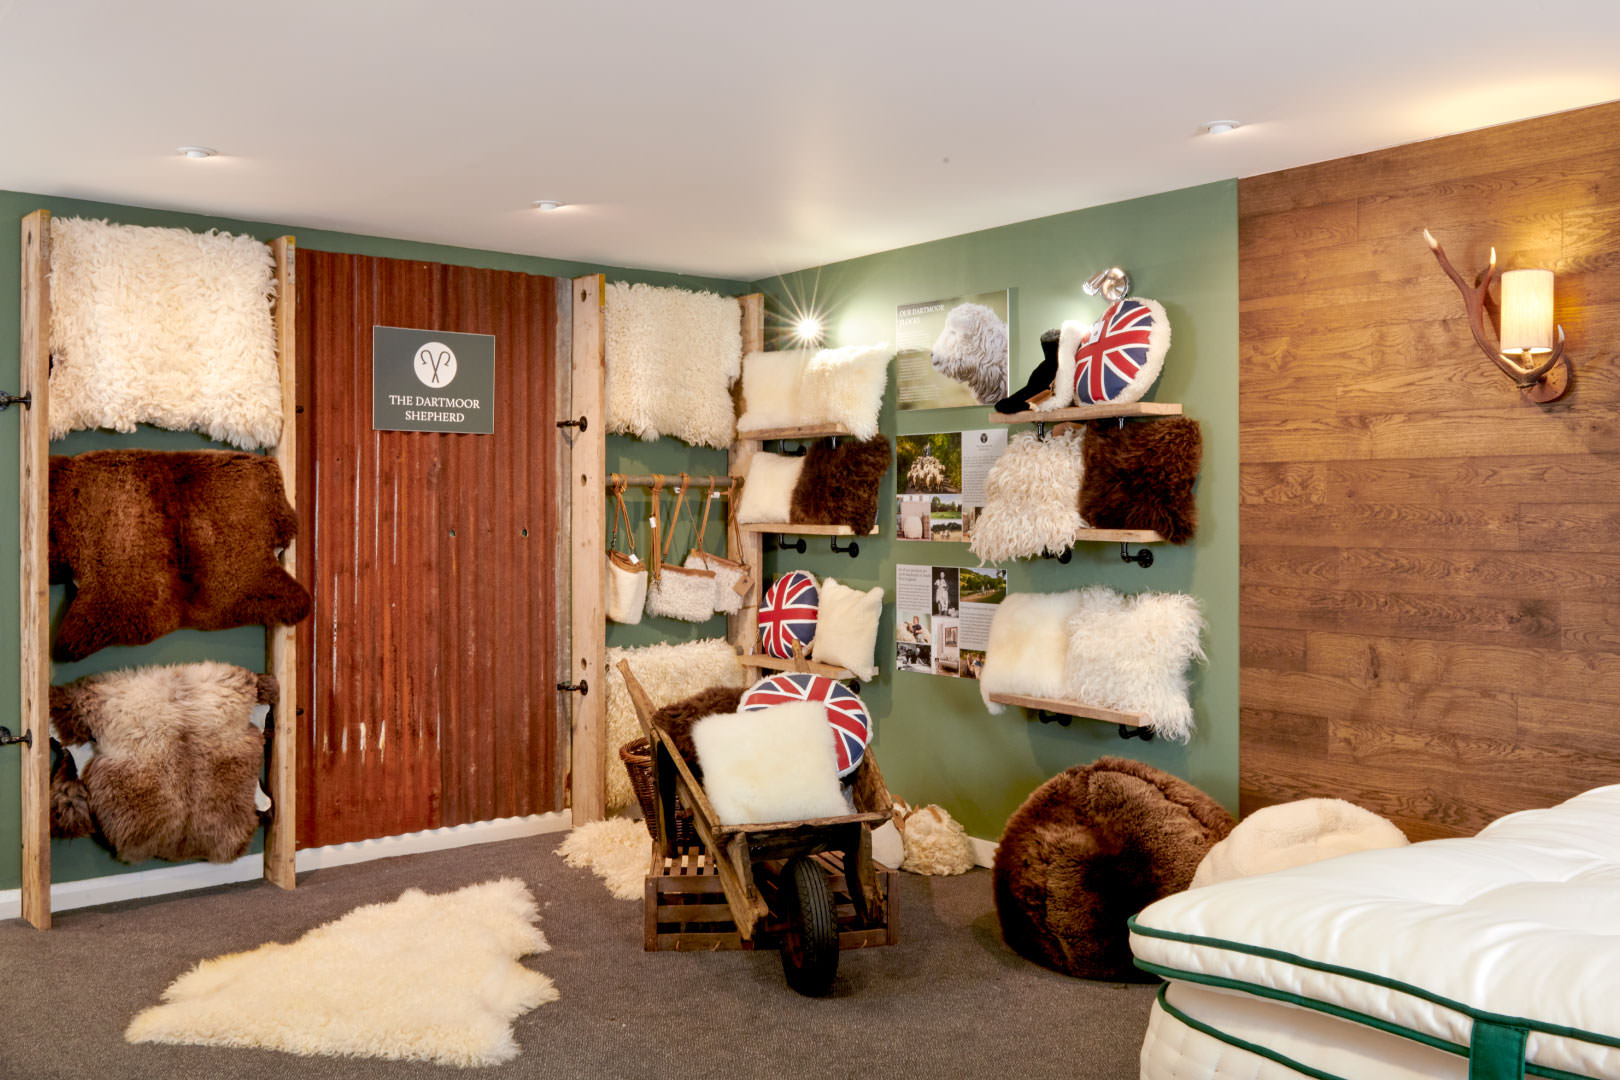 The-Dartmoor-Shepherd-Display-At-Our-Horsham-Store